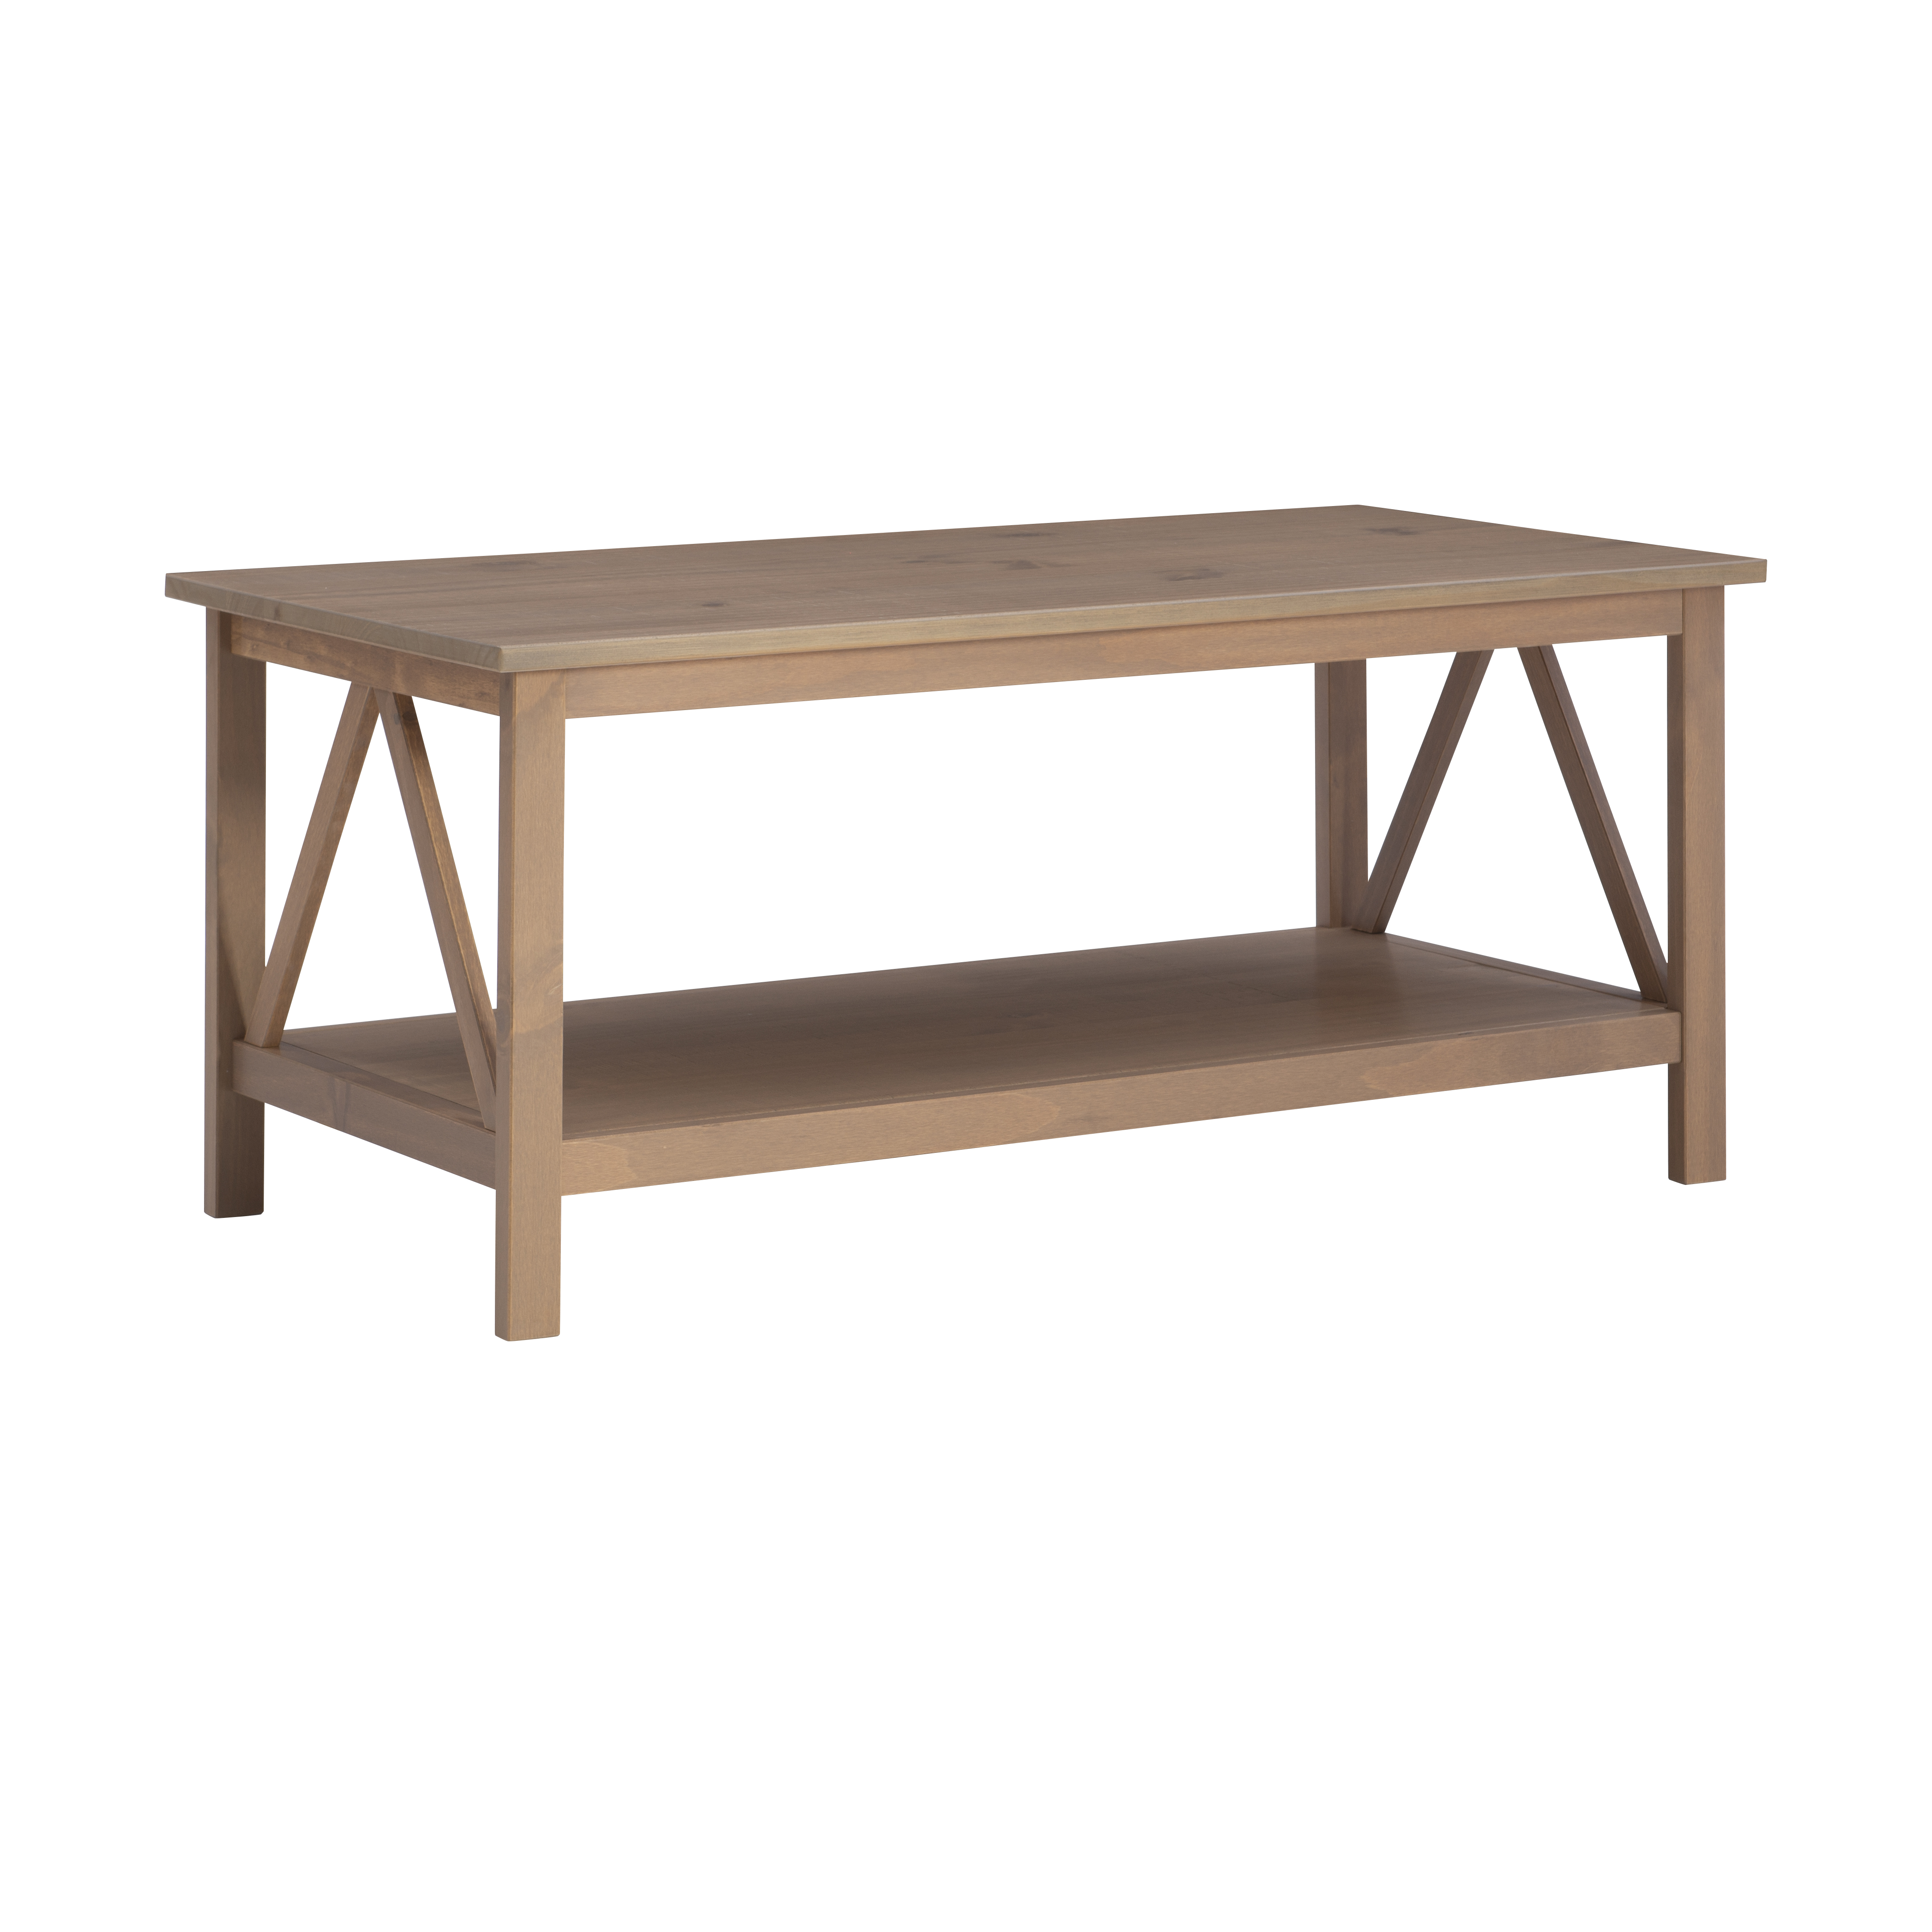 Linon Home Titian Coffee Table 20 Inches Tall Multiple Colors Walmart Com Walmart Com